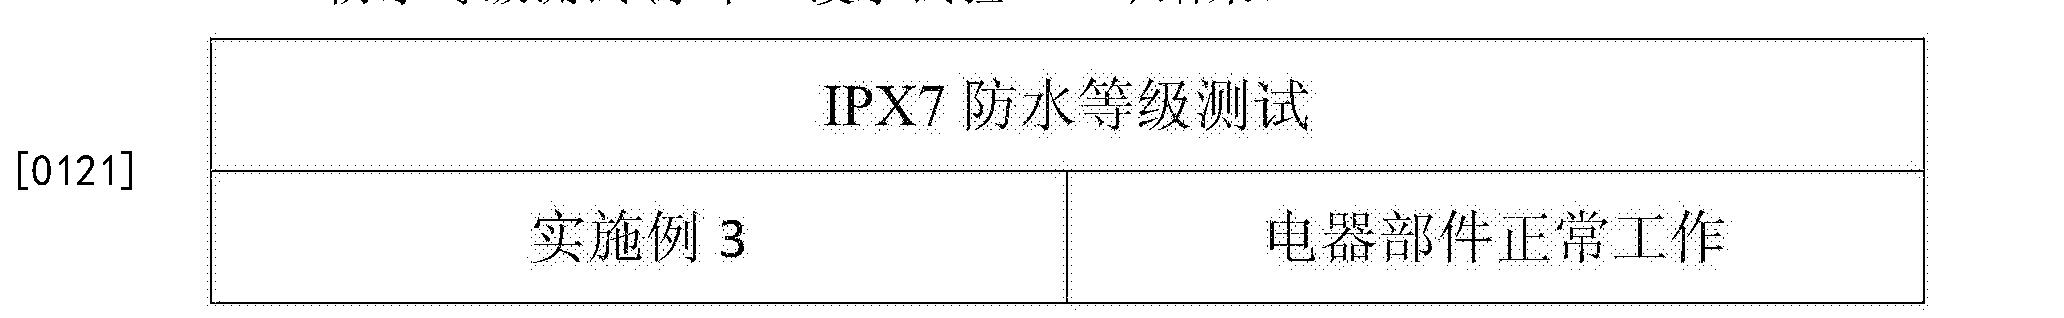 Figure CN107201510AD00133